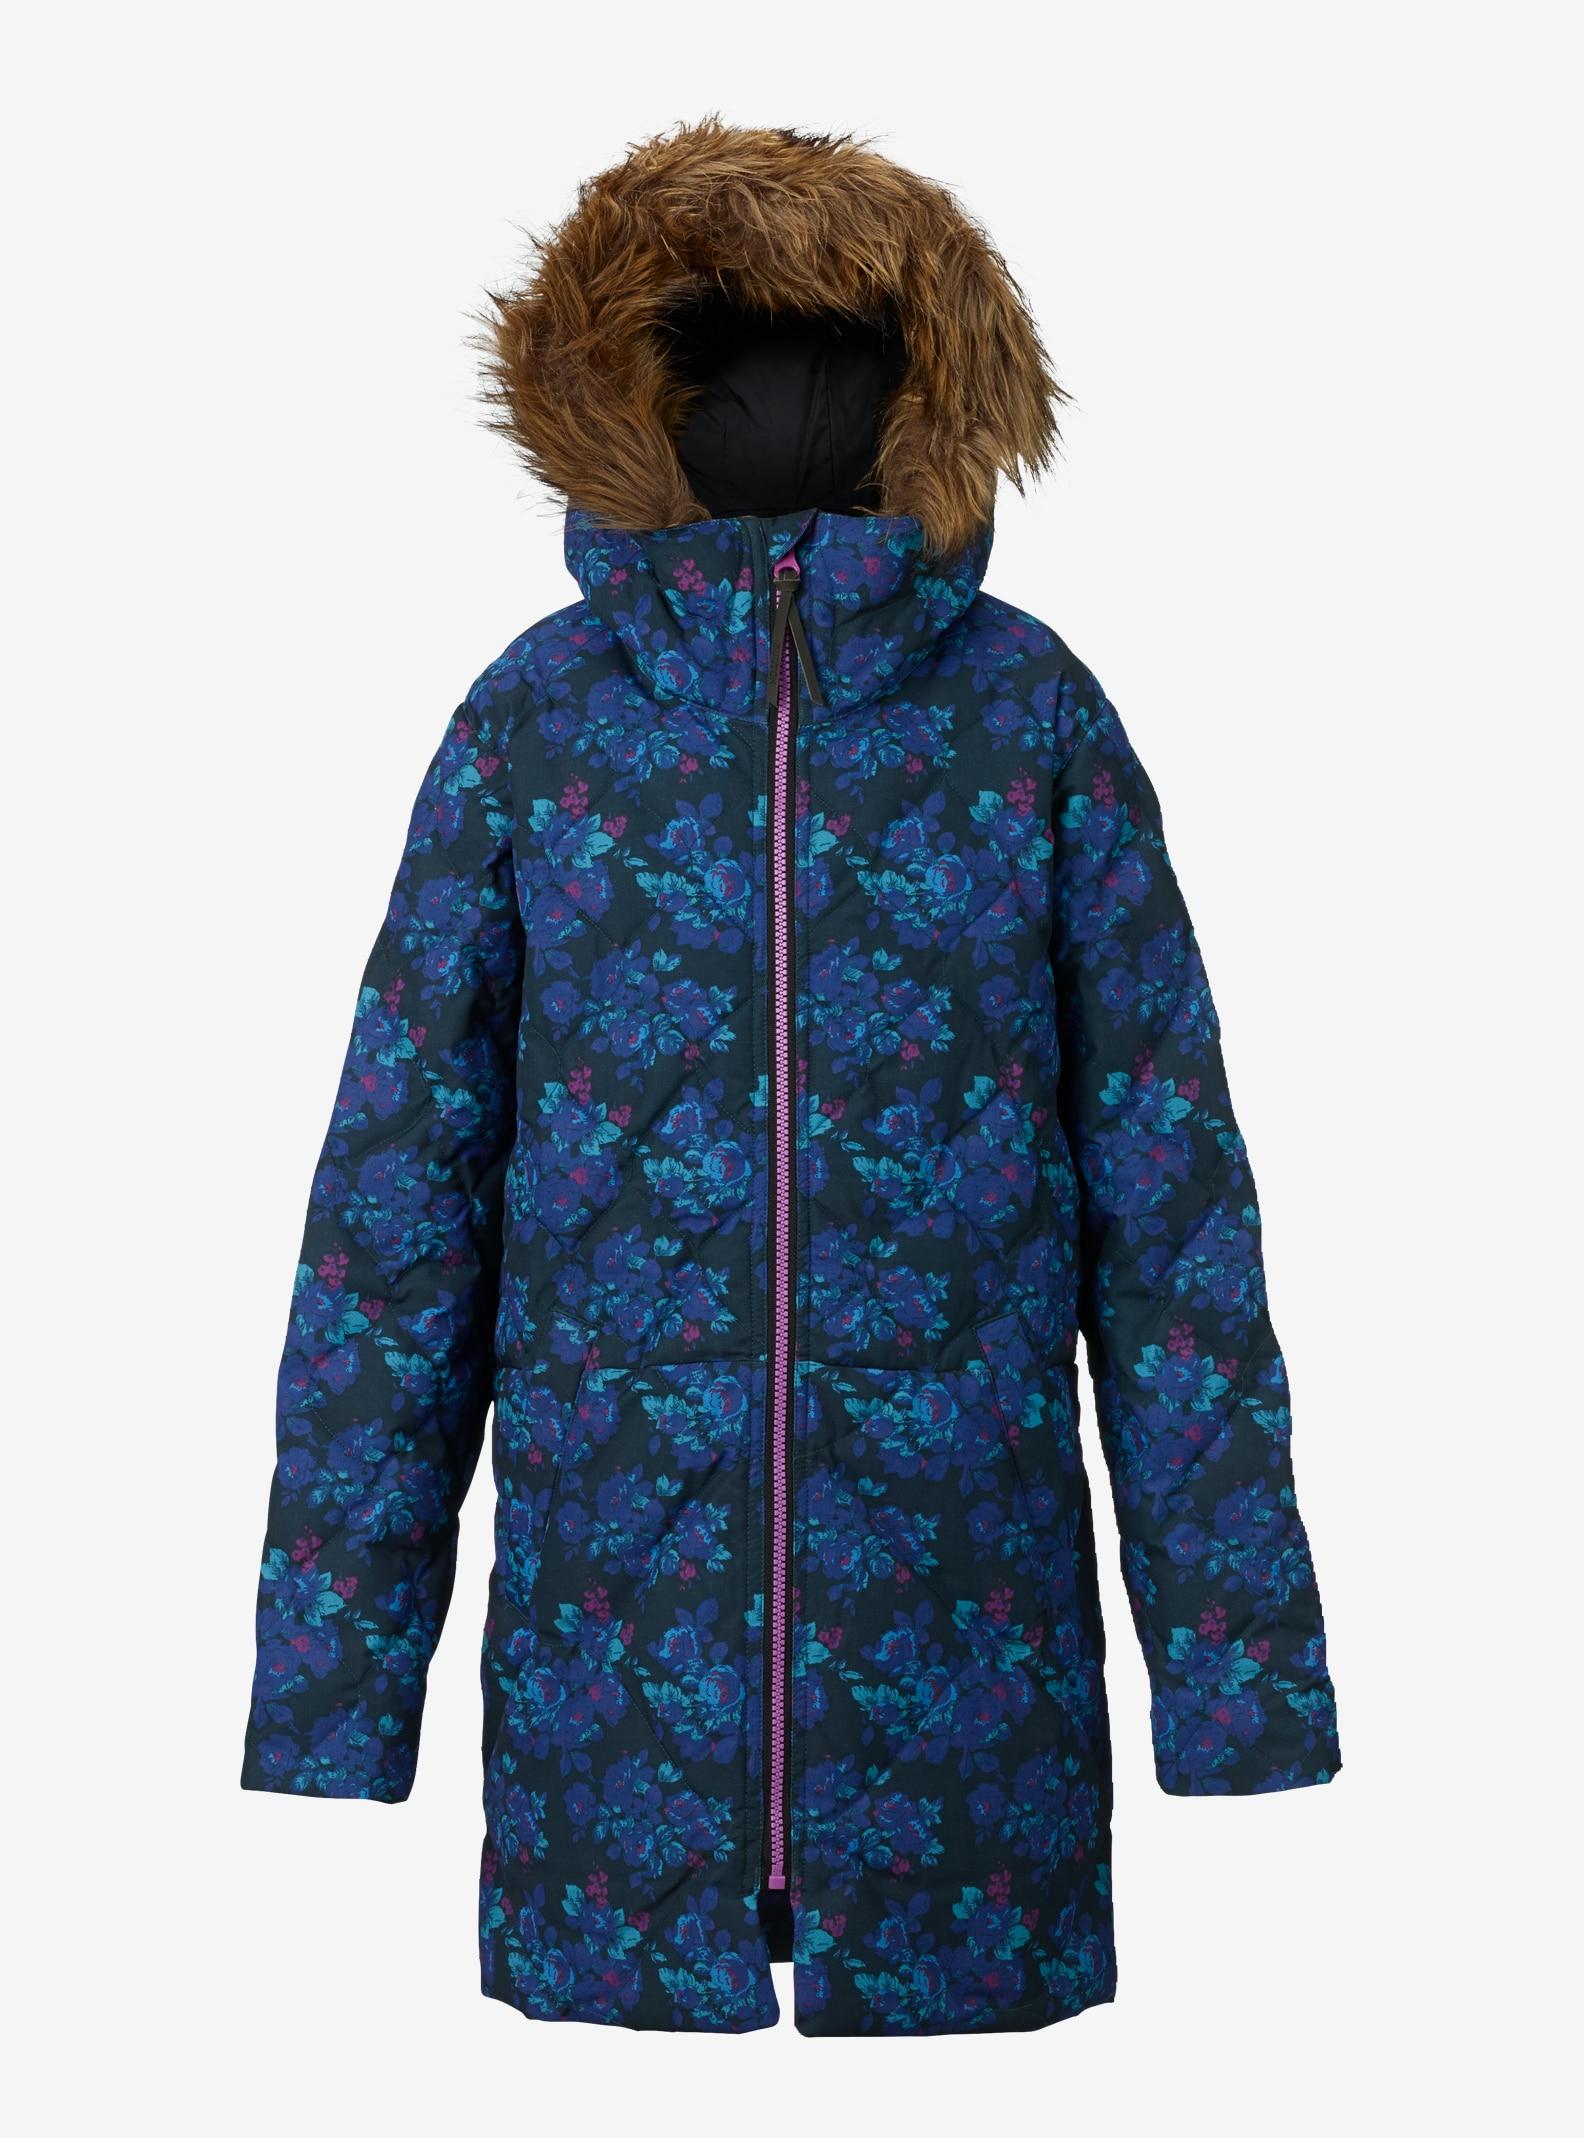 Girls' Burton Lovell Jacket shown in Pop Floral